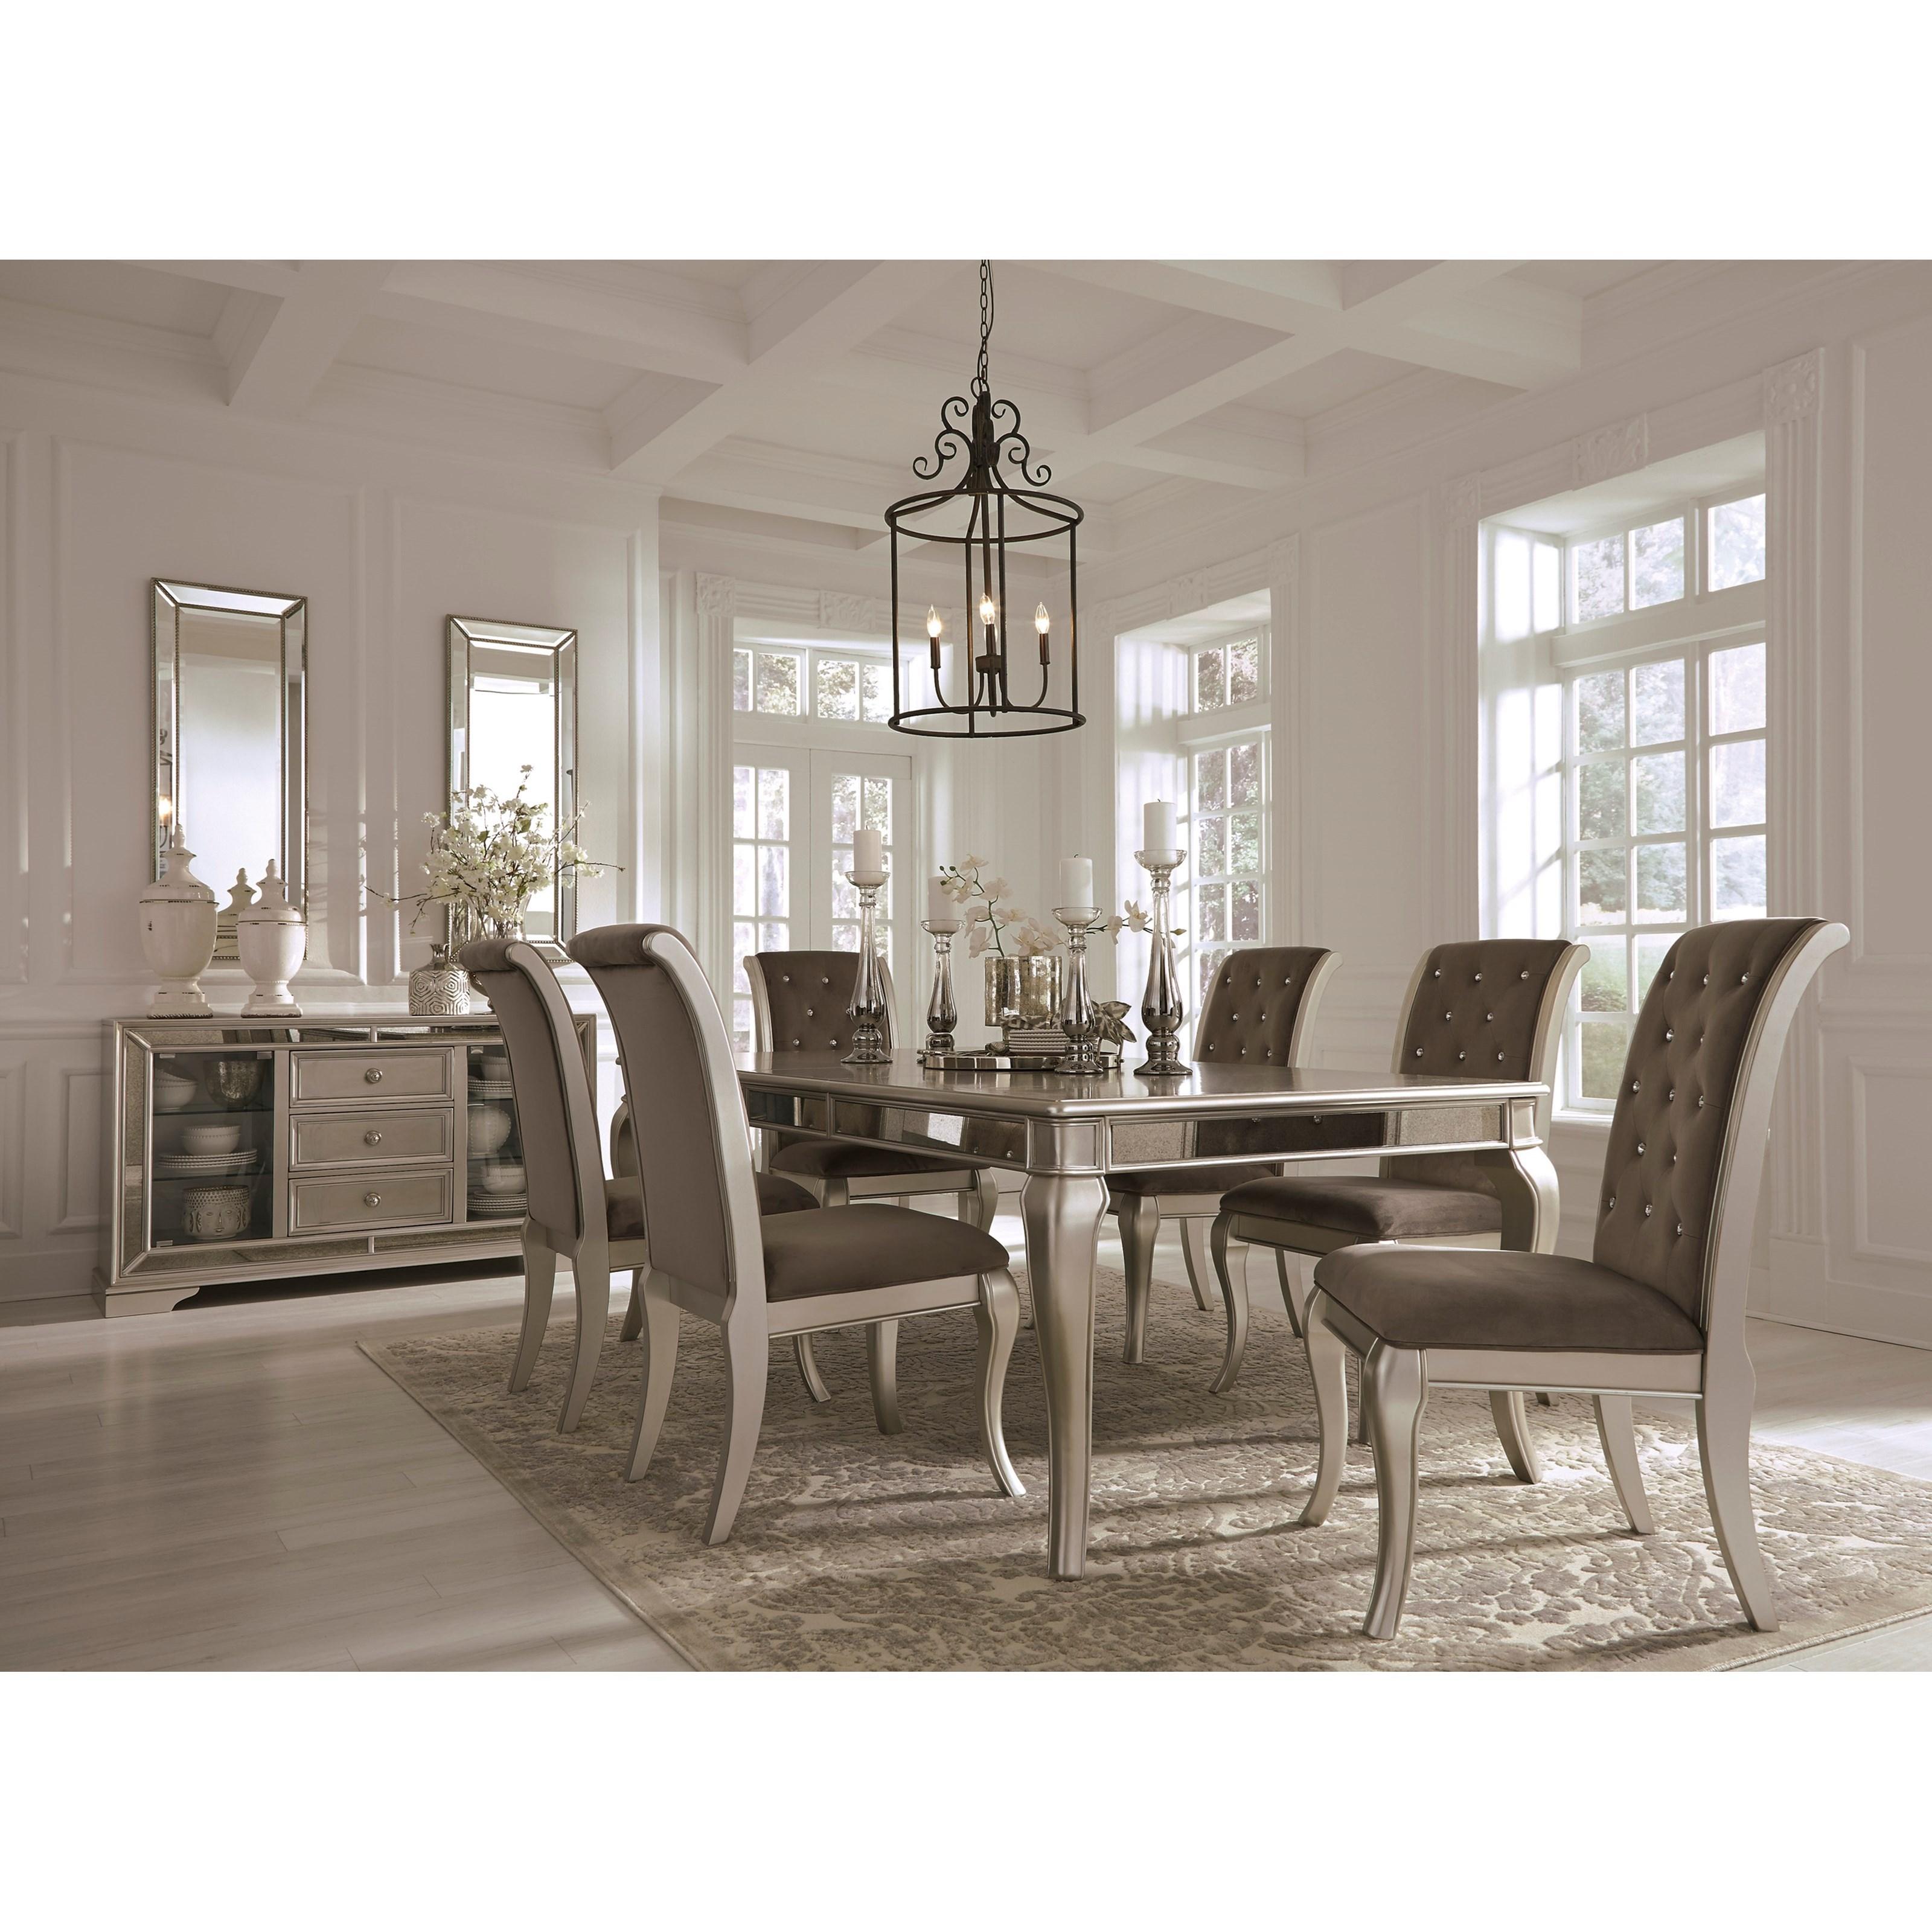 Beau Ashley Signature Design Birlanny Formal Dining Room Group